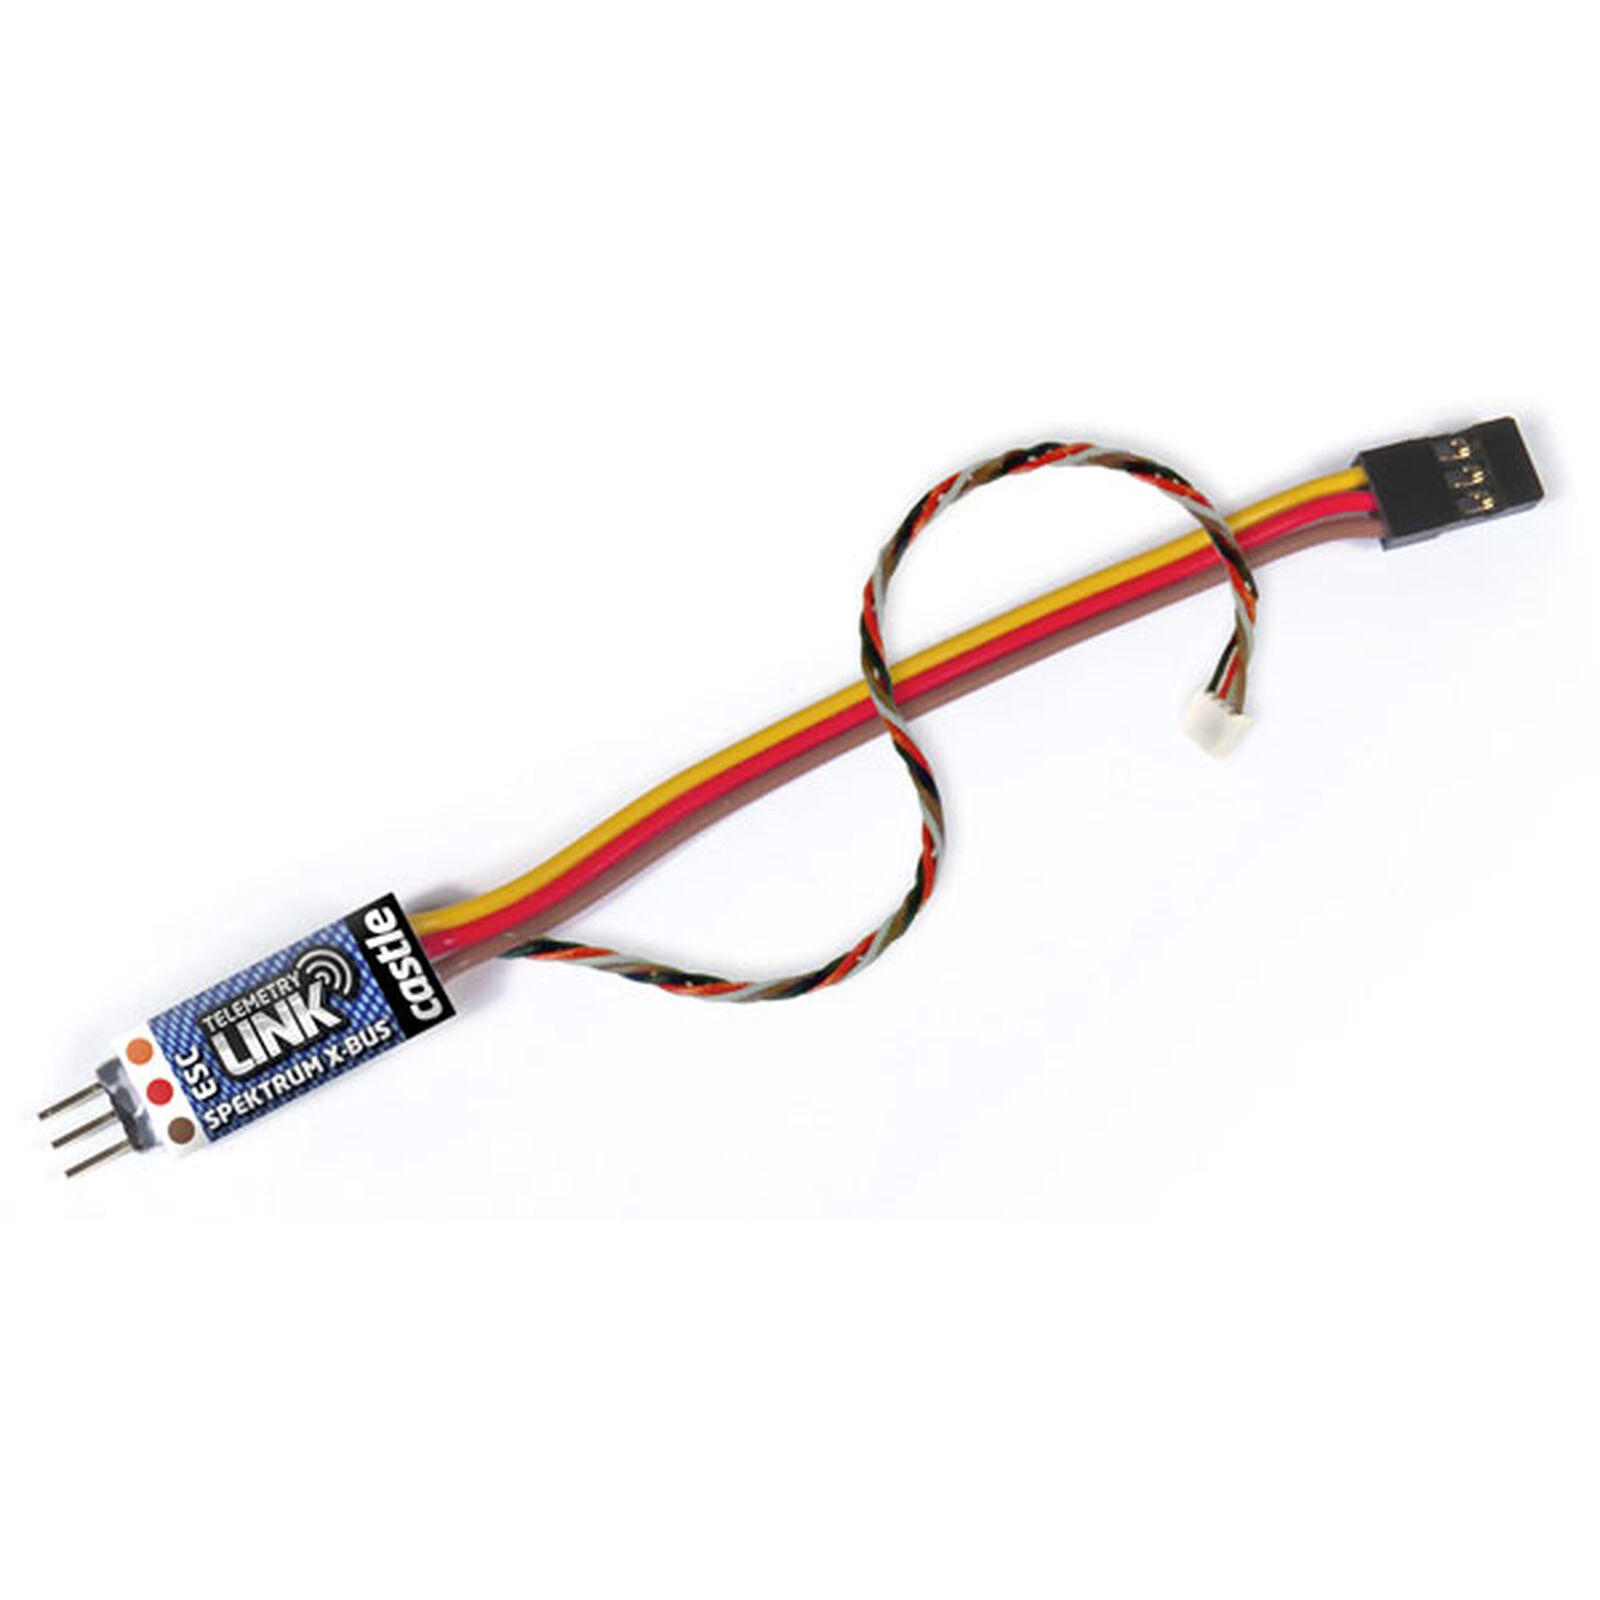 Telemetry Link X-Bus, Spektrum Compatible